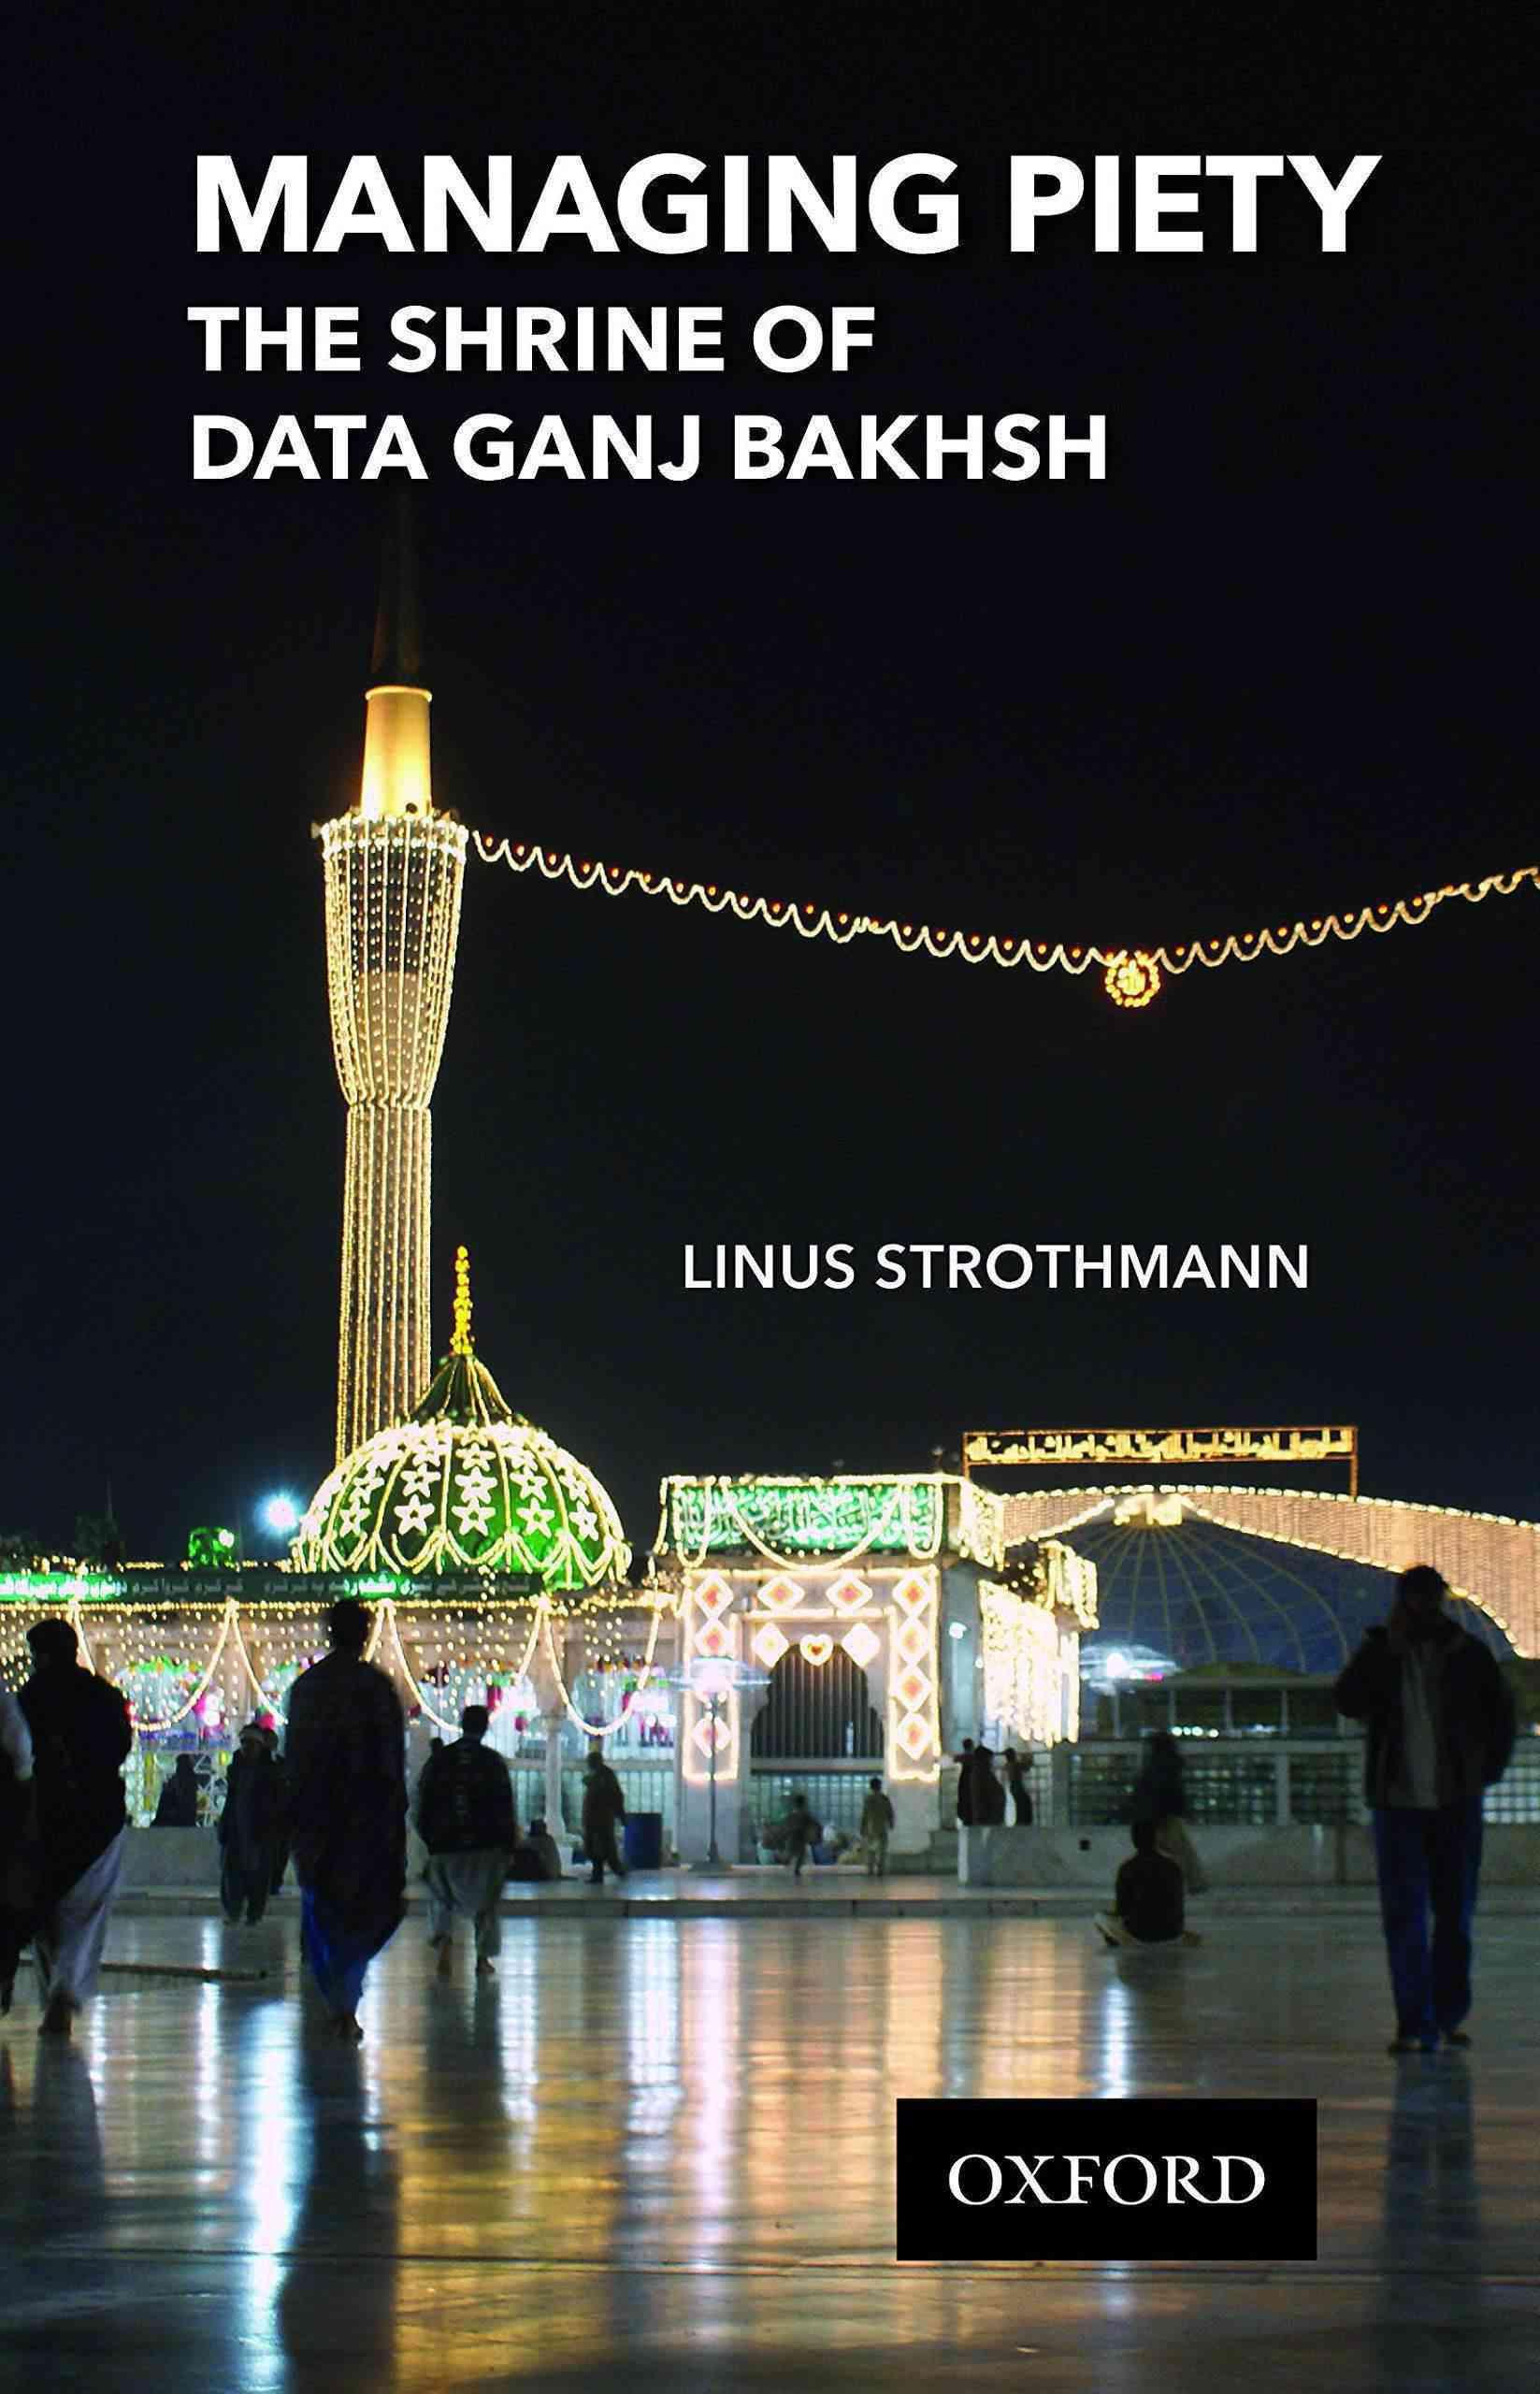 Managing Piety: The Shrine of Data Ganj Bakhsh